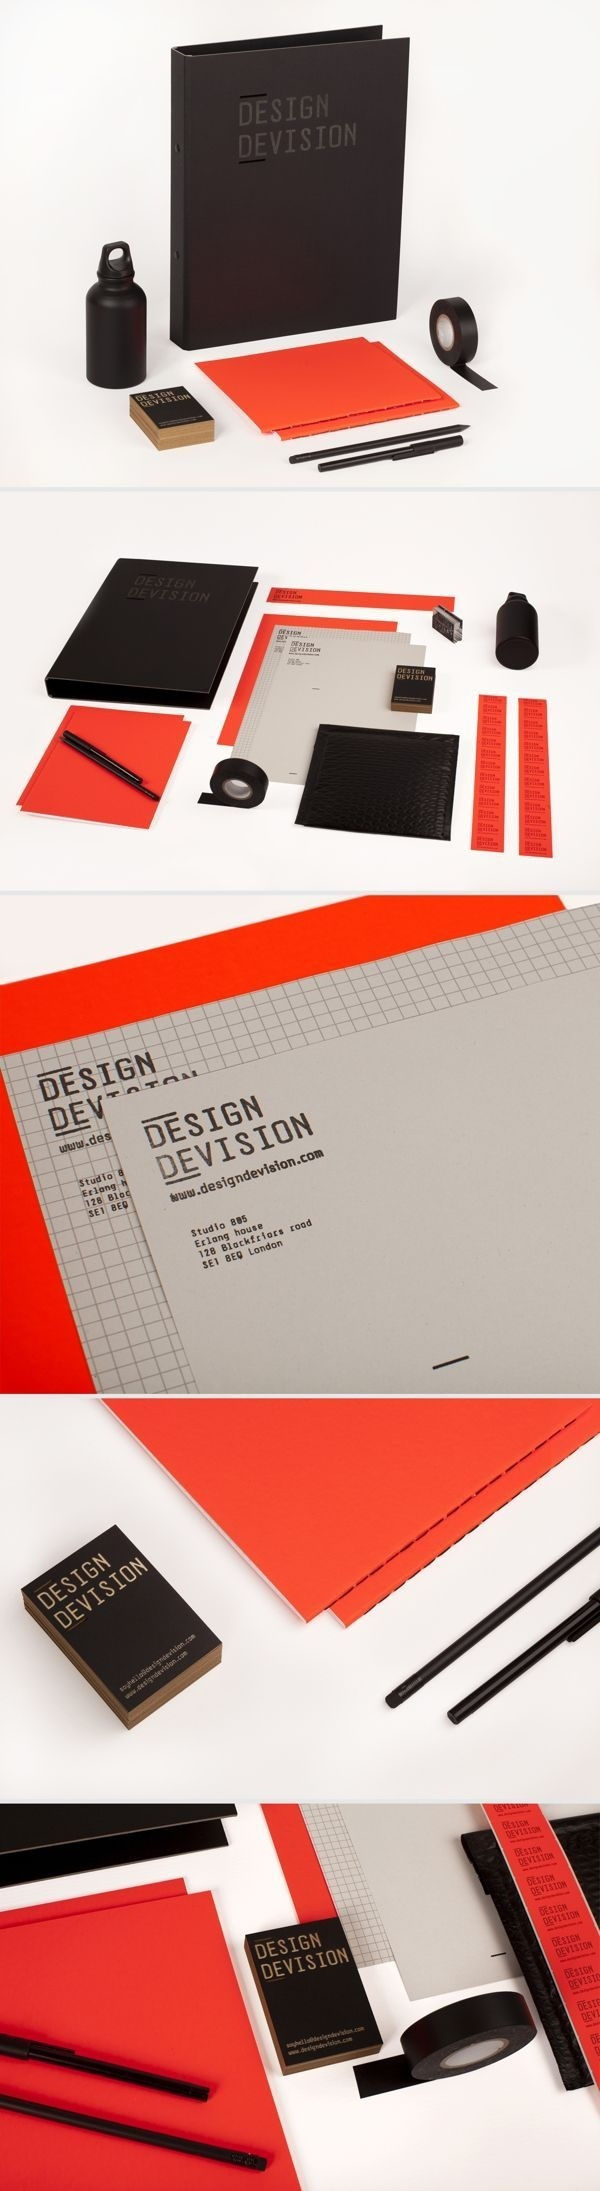 Design Devision #brand #identity